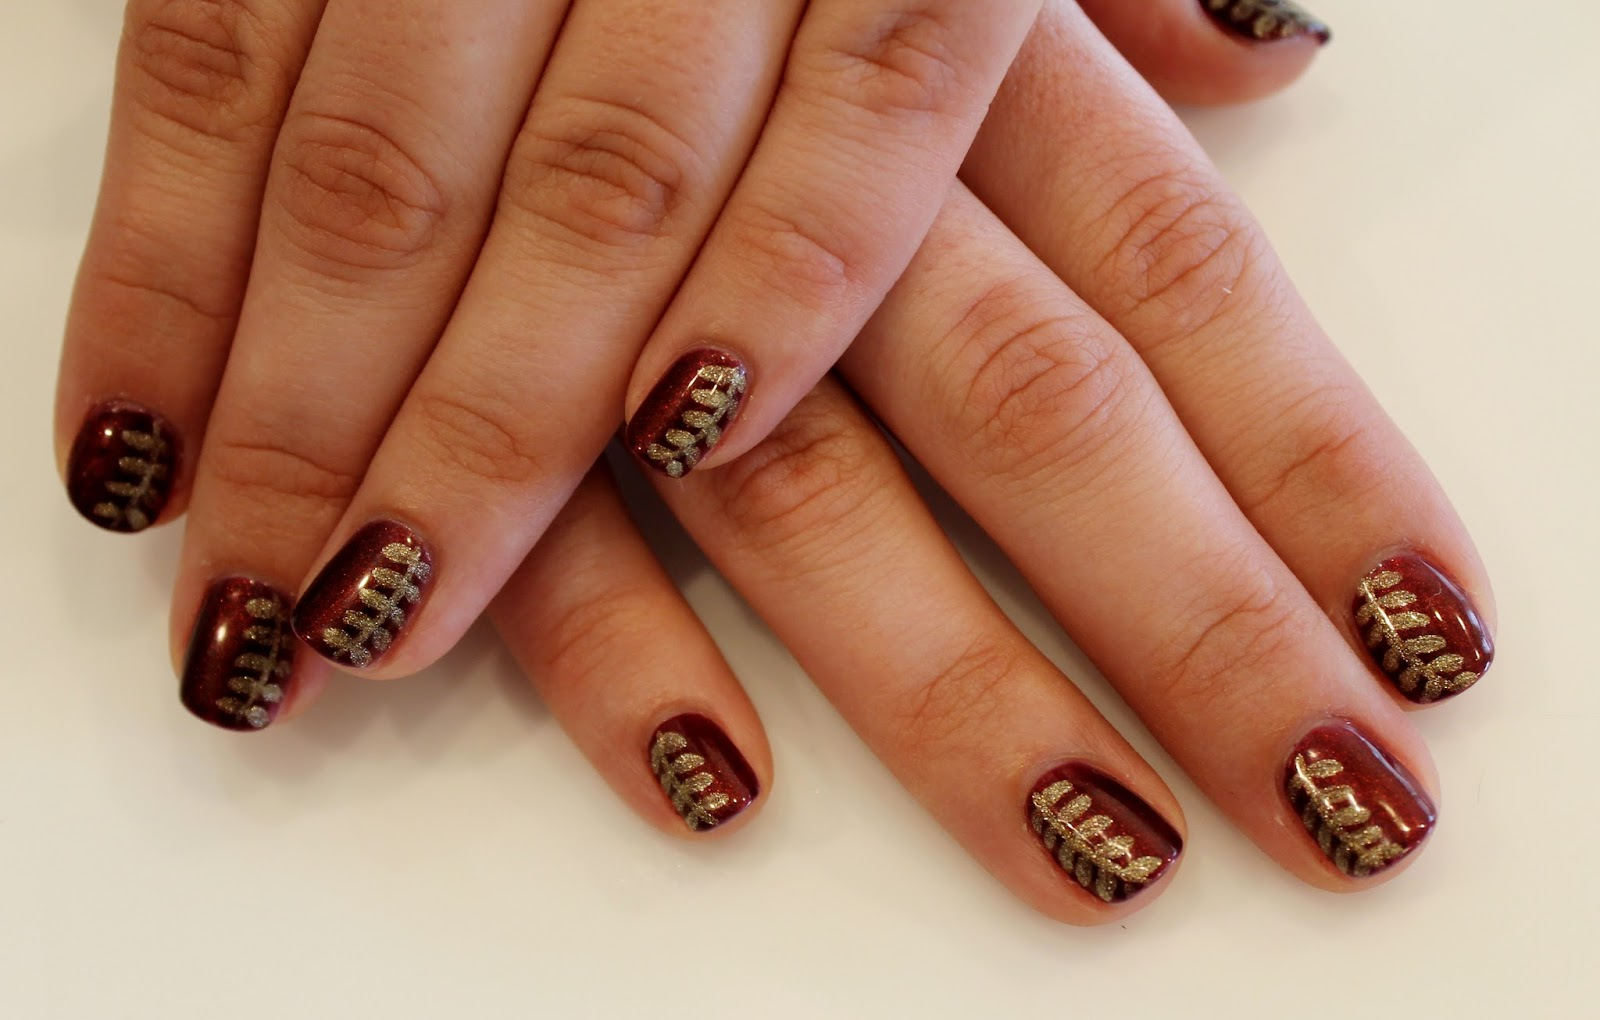 ManiMondays: Yay for Fall Nails!